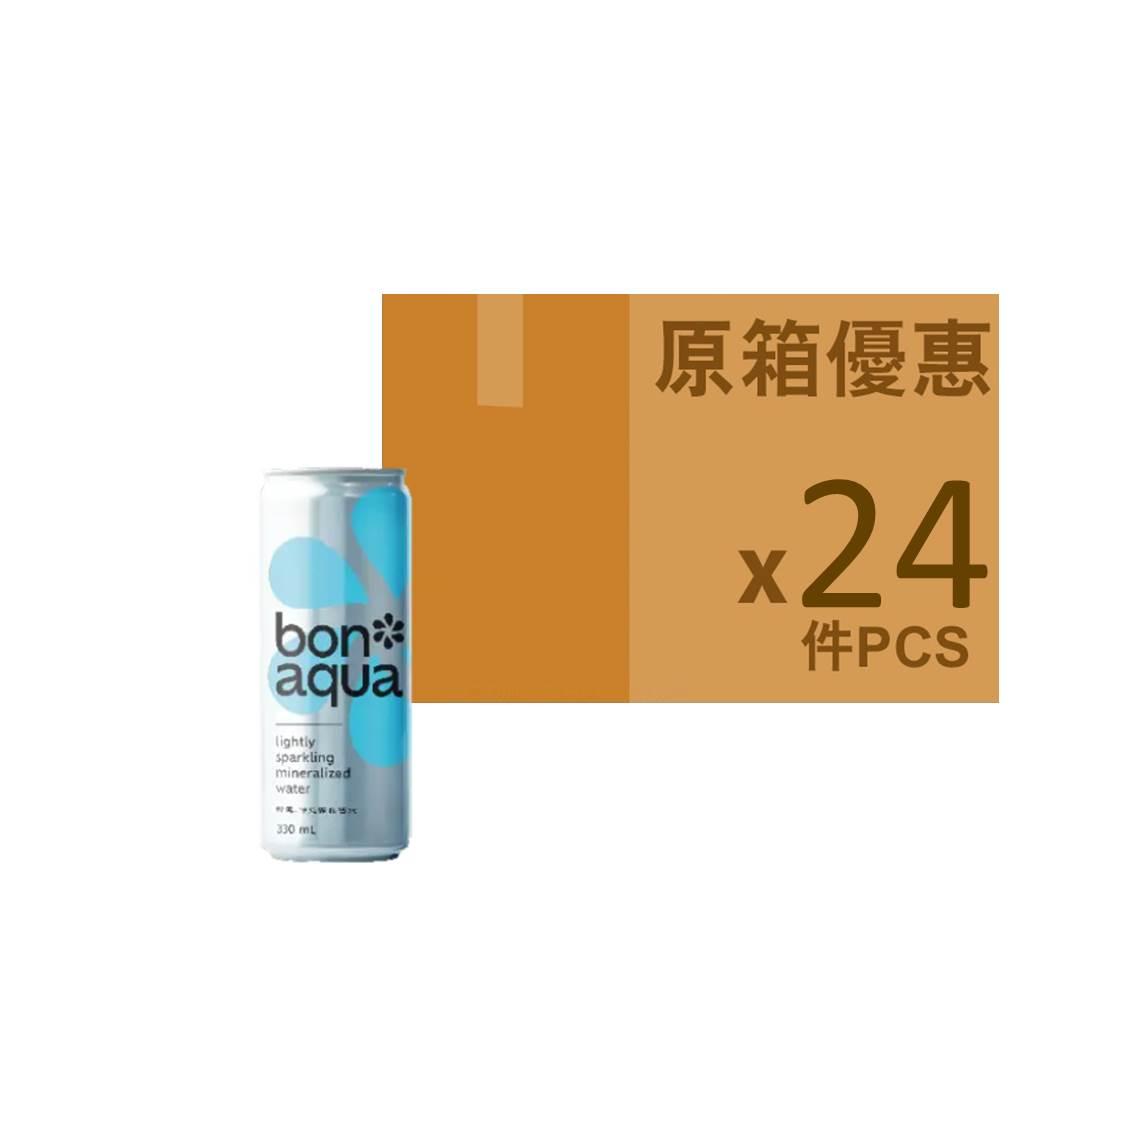 BONAQUA 微氣礦物質水 330ML (原箱)